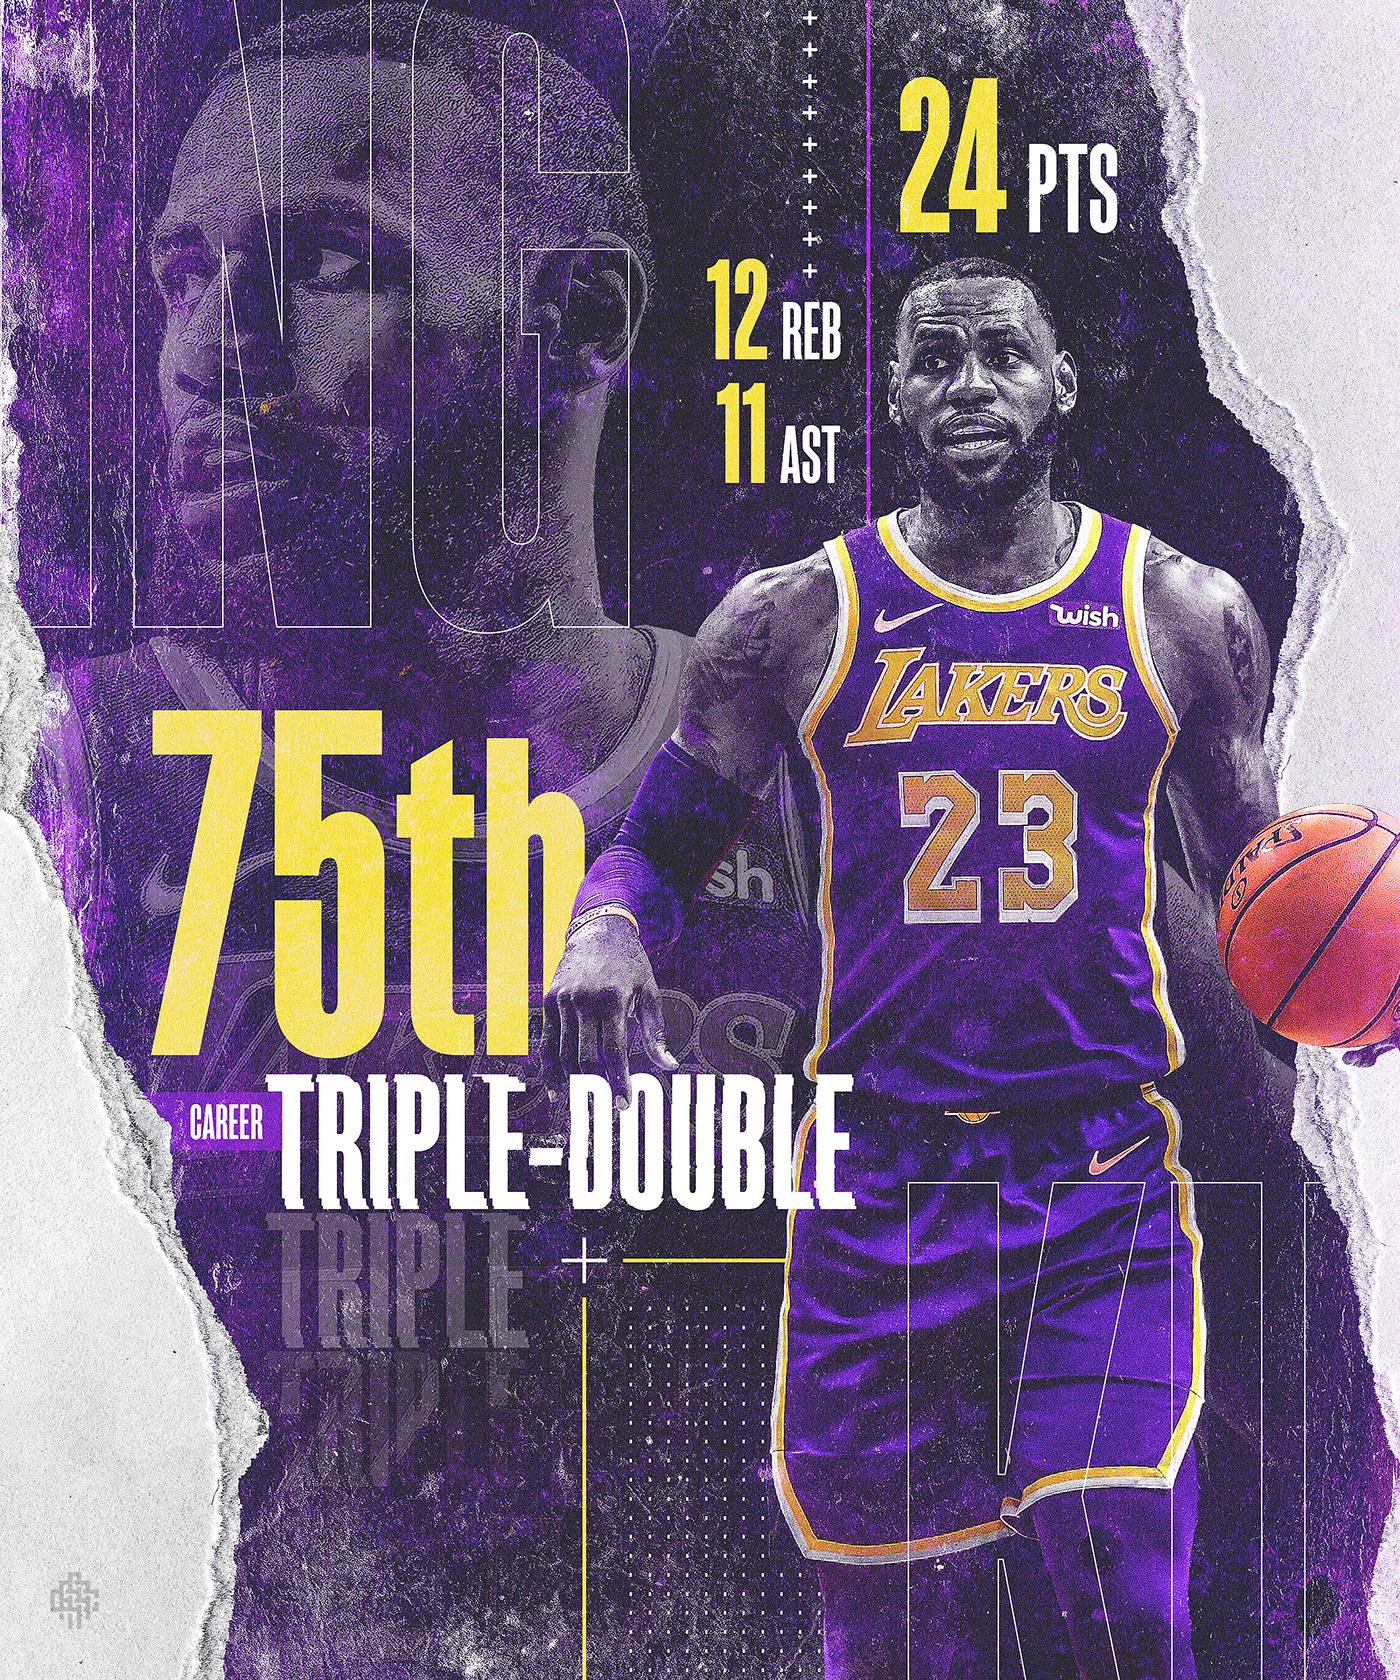 97d07d381be Nike Spoof Kobe Bryant 24 Birthday Graphic on